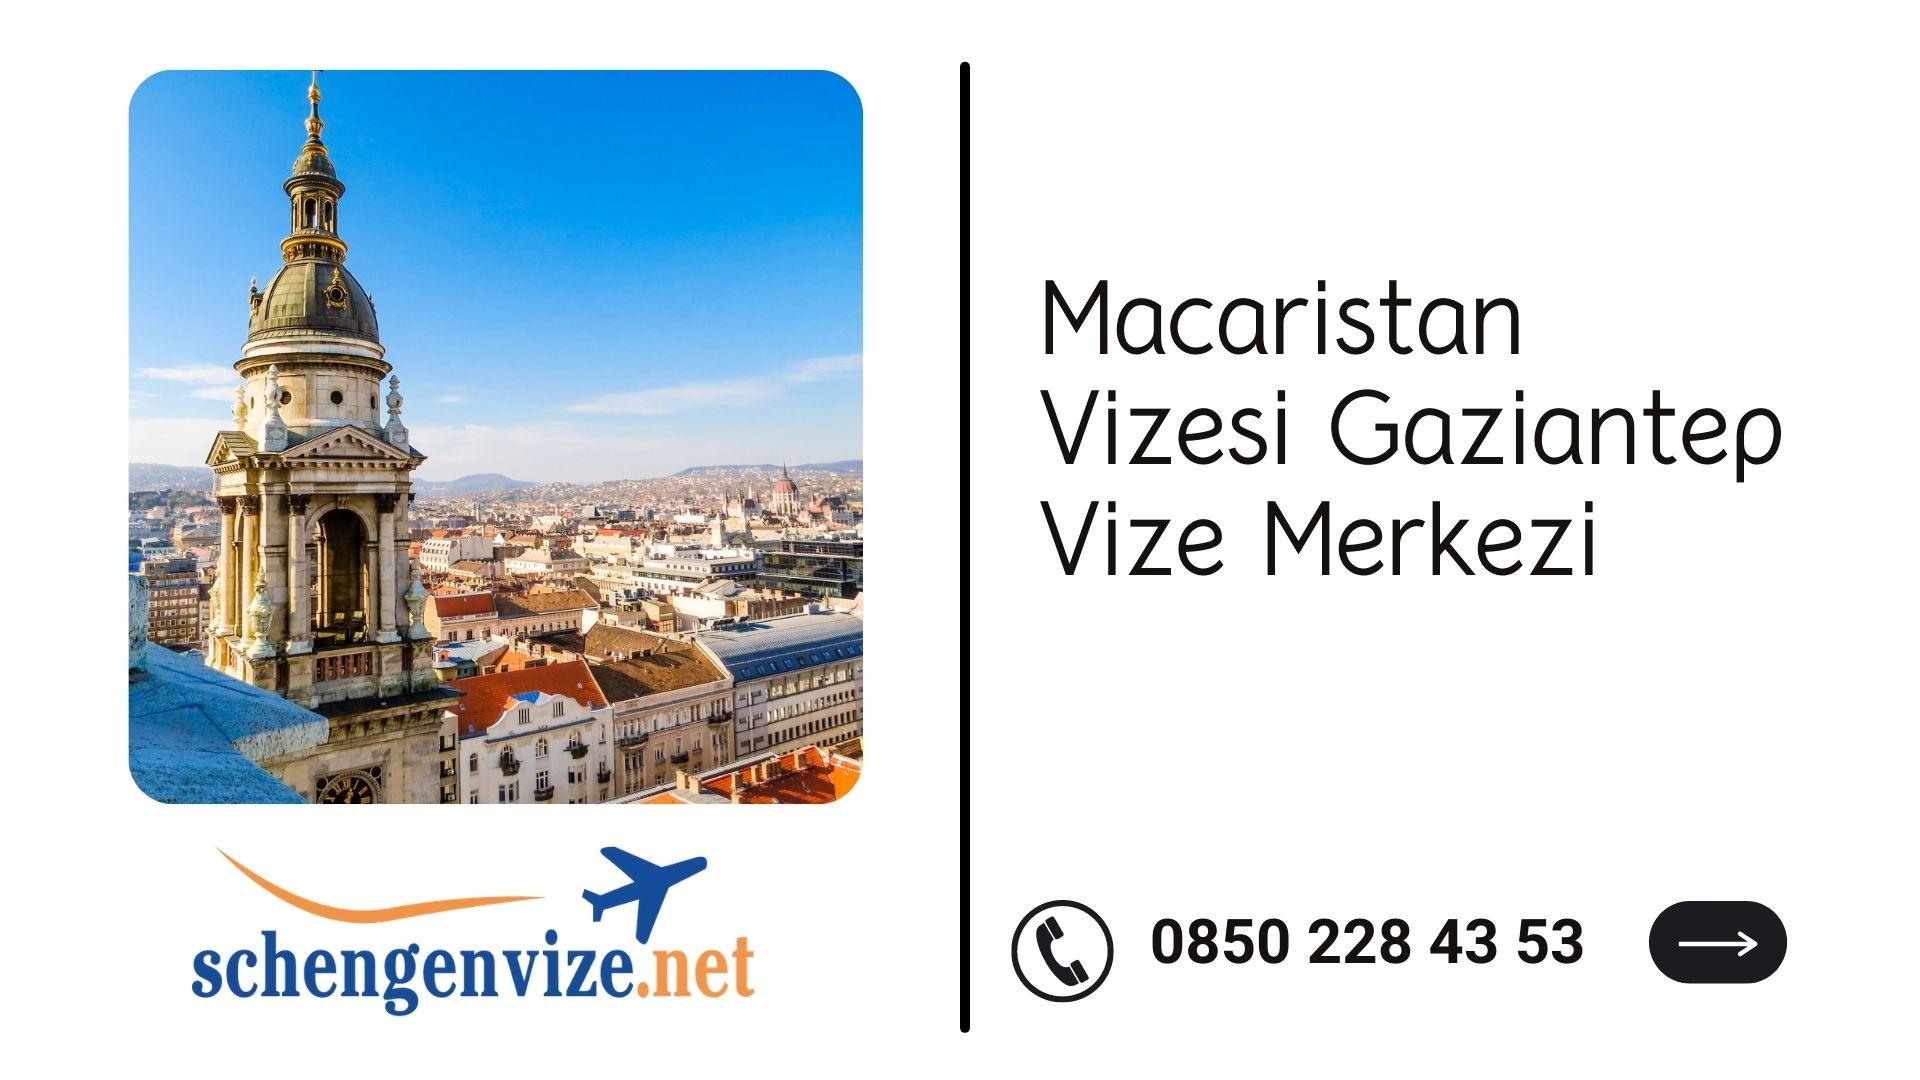 Macaristan Vizesi Gaziantep Vize Merkezi